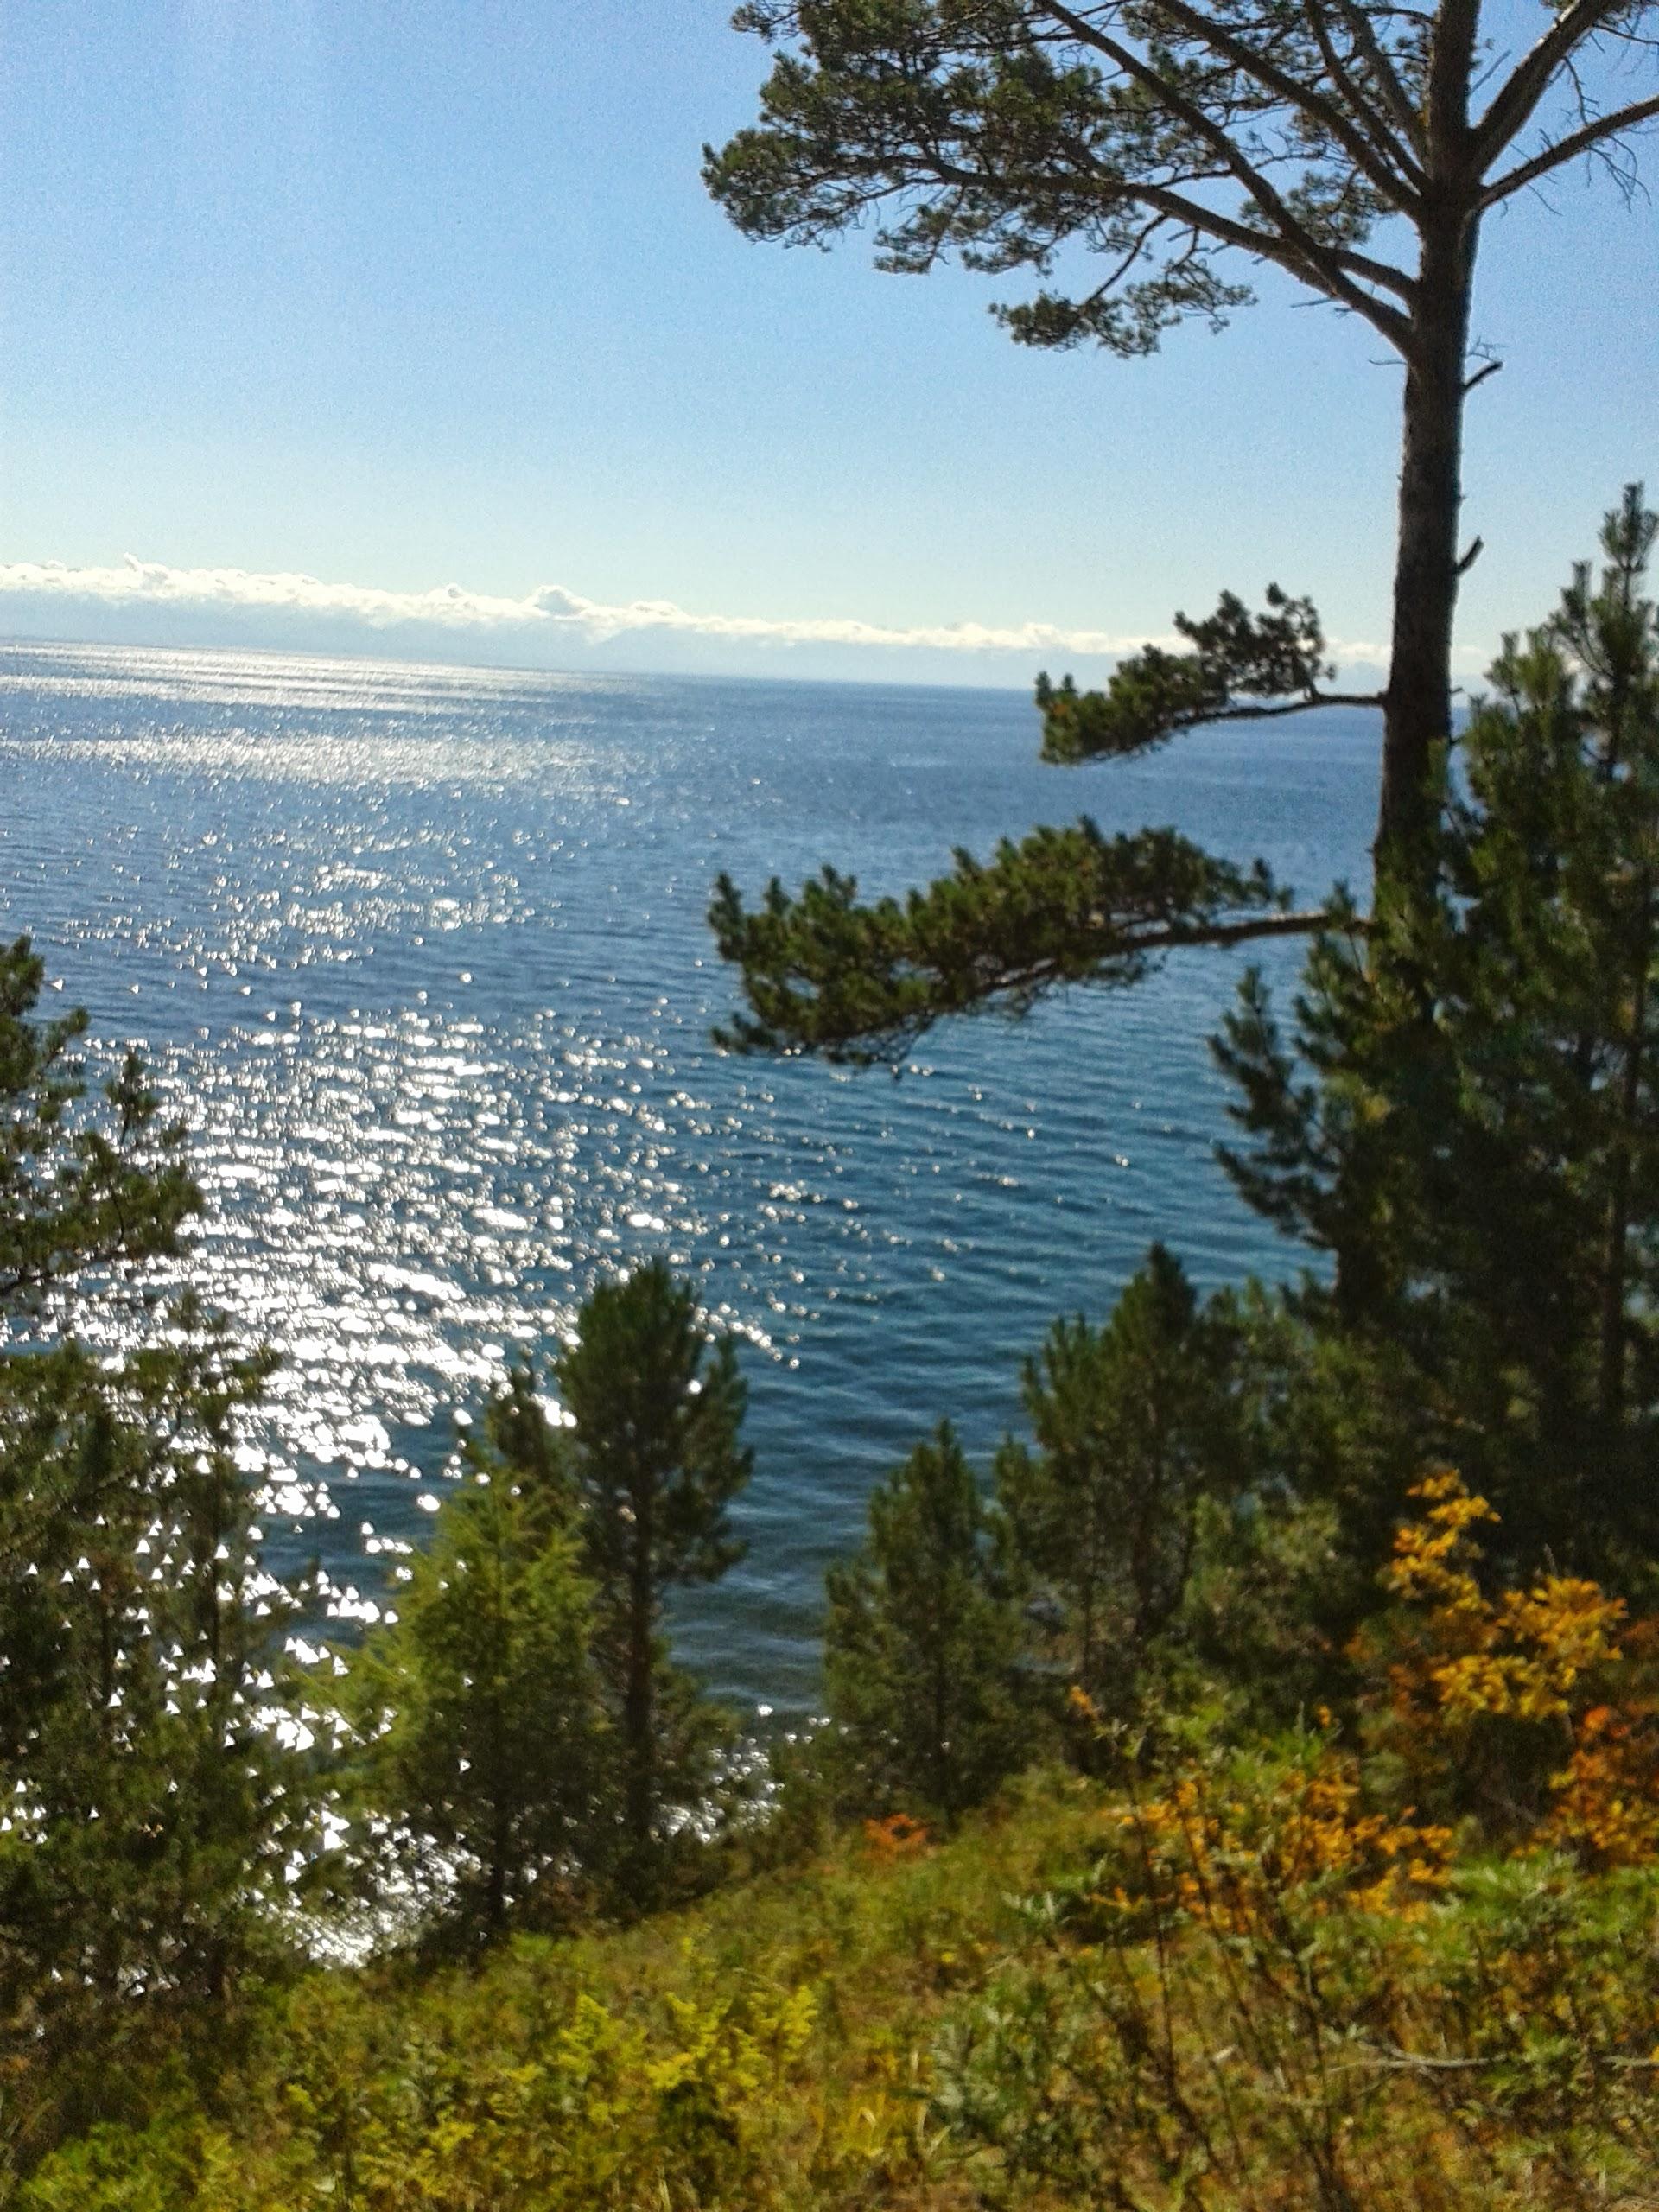 Lake Baikal, in SIberia, Russia